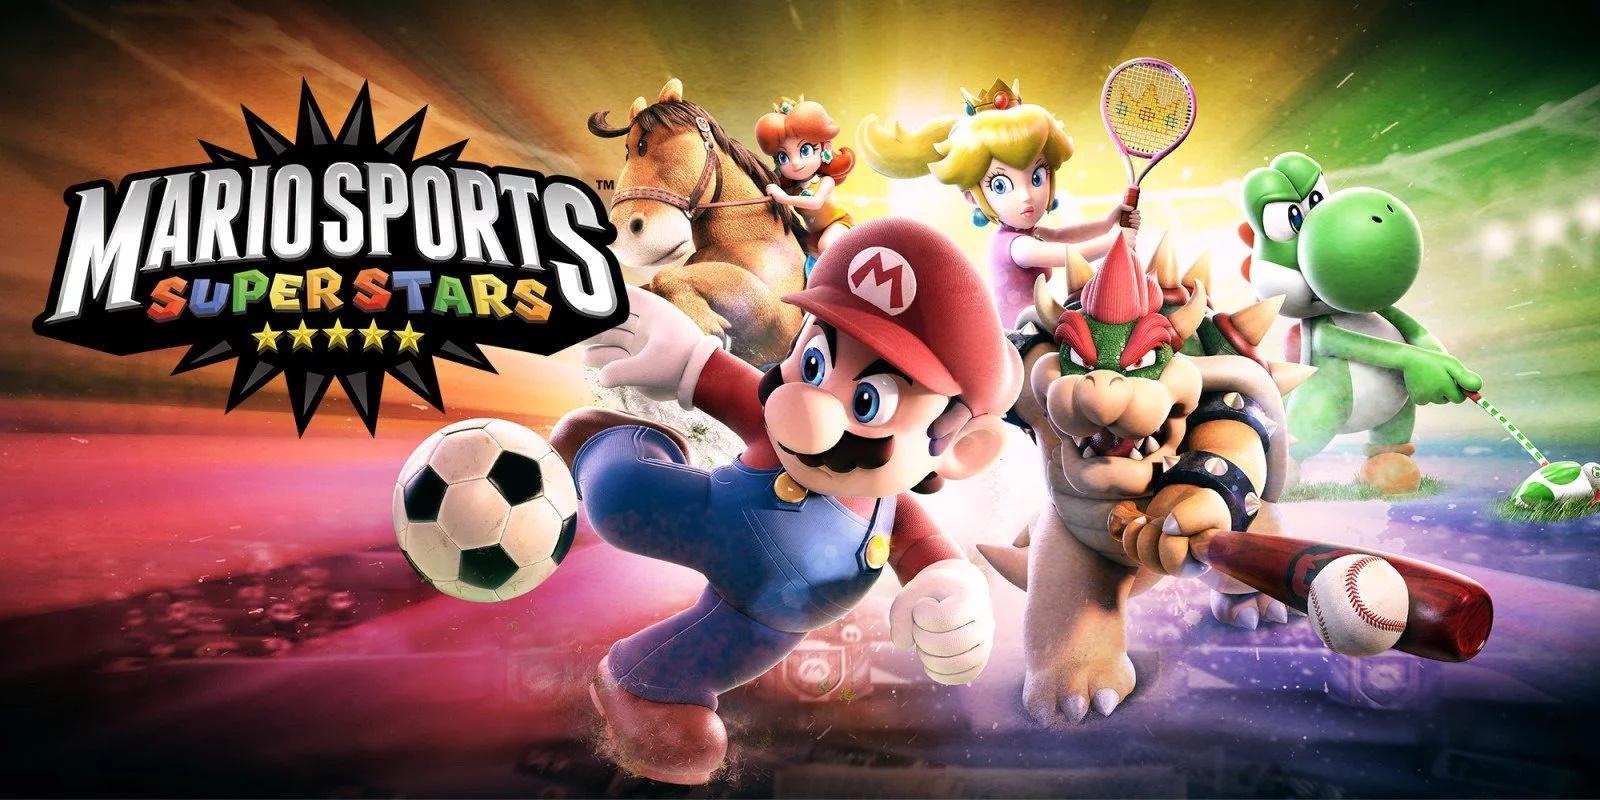 nintendo-trademarks-mario-sports-in-europe-australia.jpg